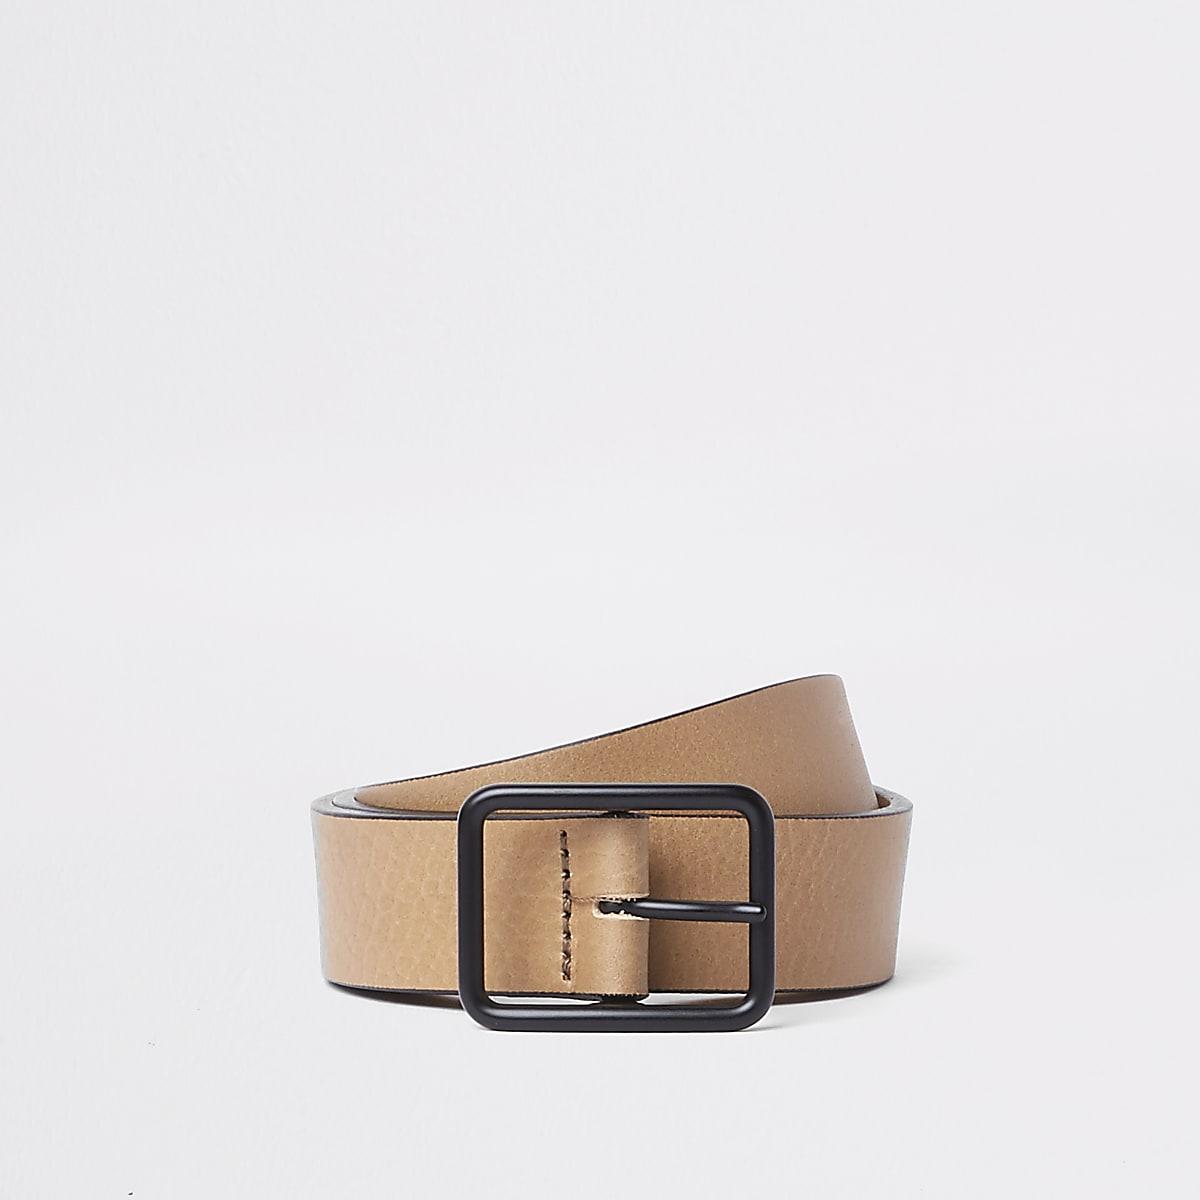 Light brown tan leather belt